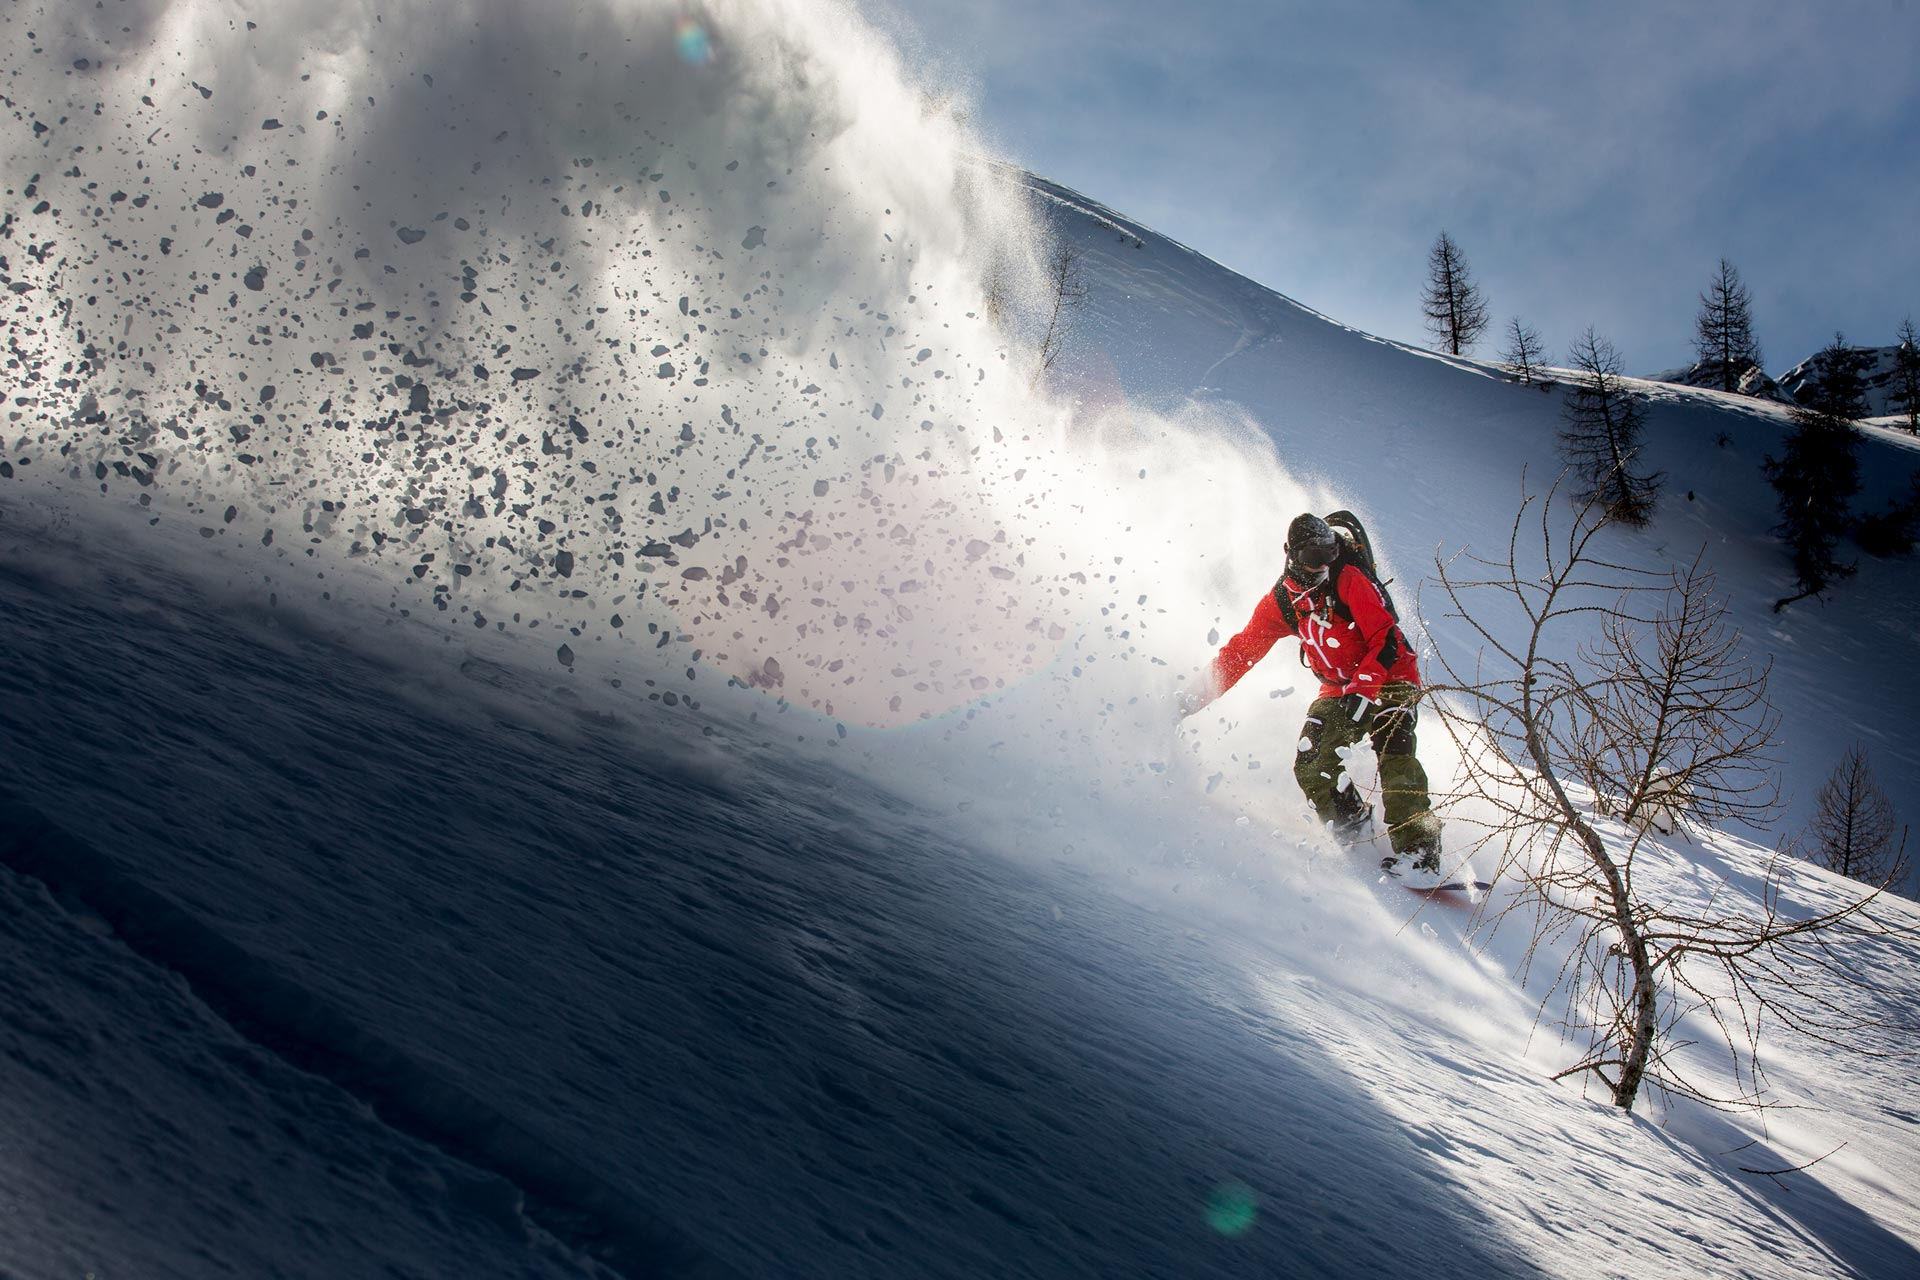 Rider: Mario Kaeppeli - Foto: Patrick Steiner